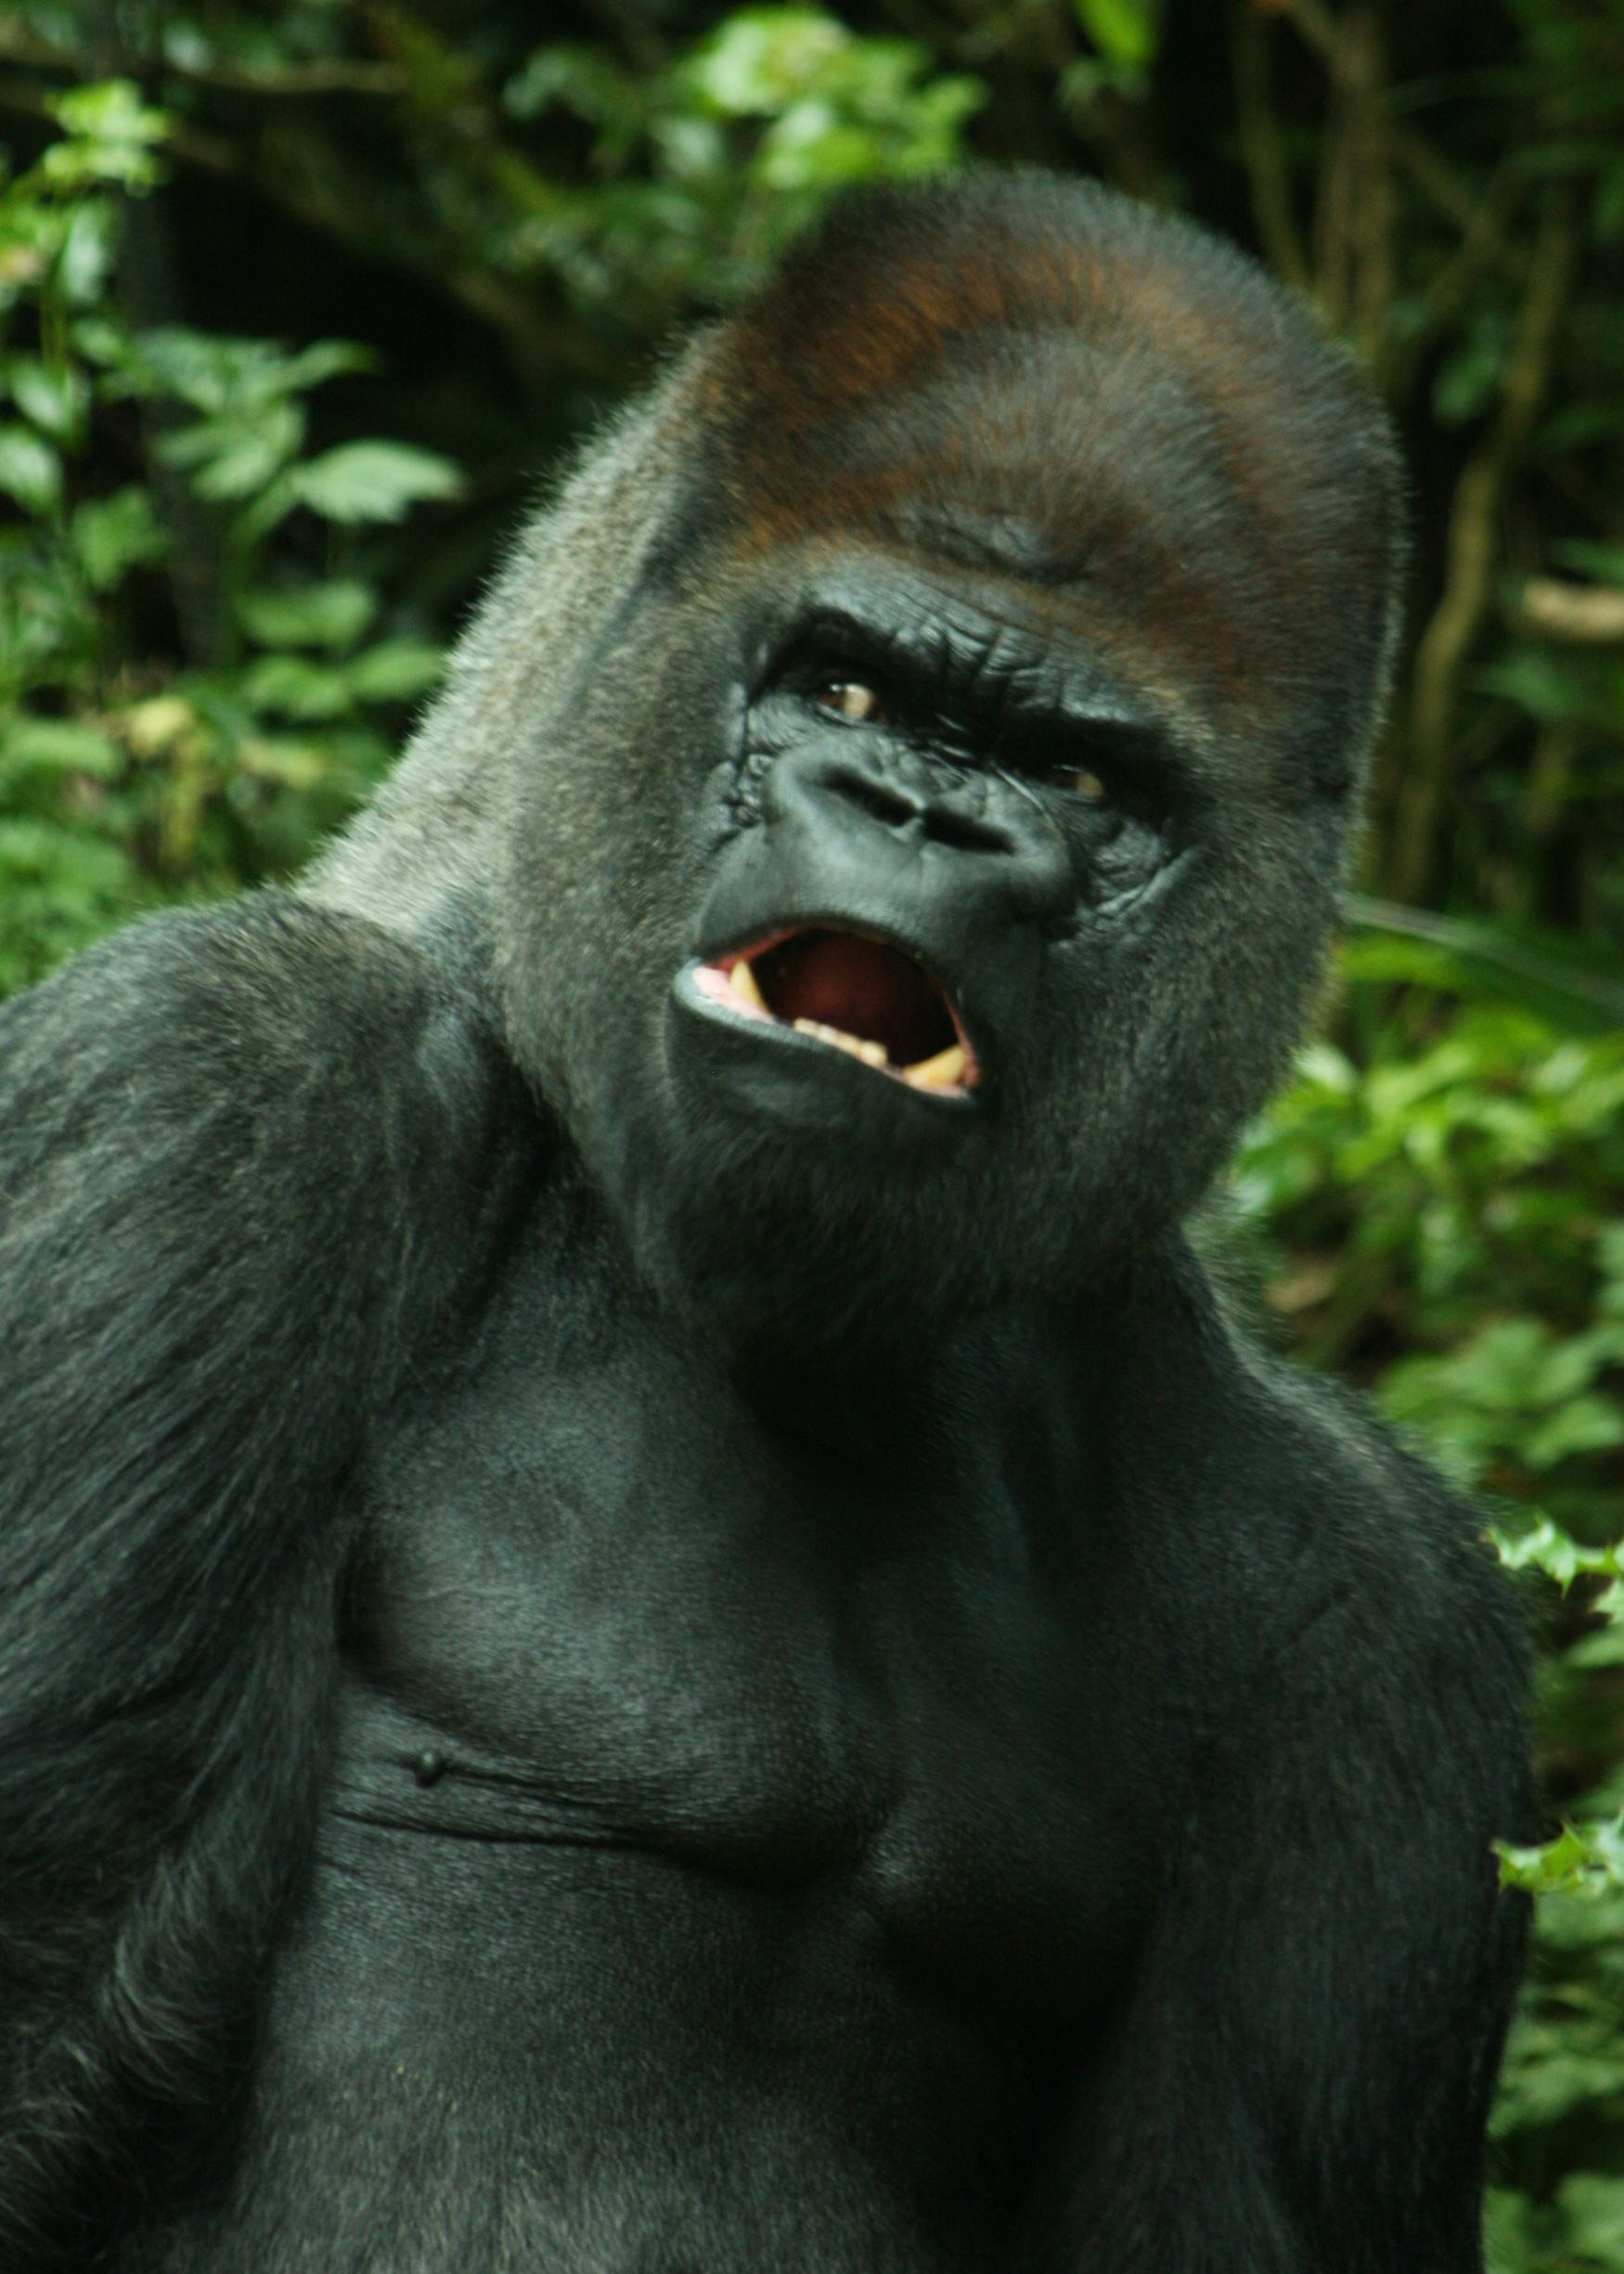 ape monkey gorilla Silverback gorilla, Animals beautiful